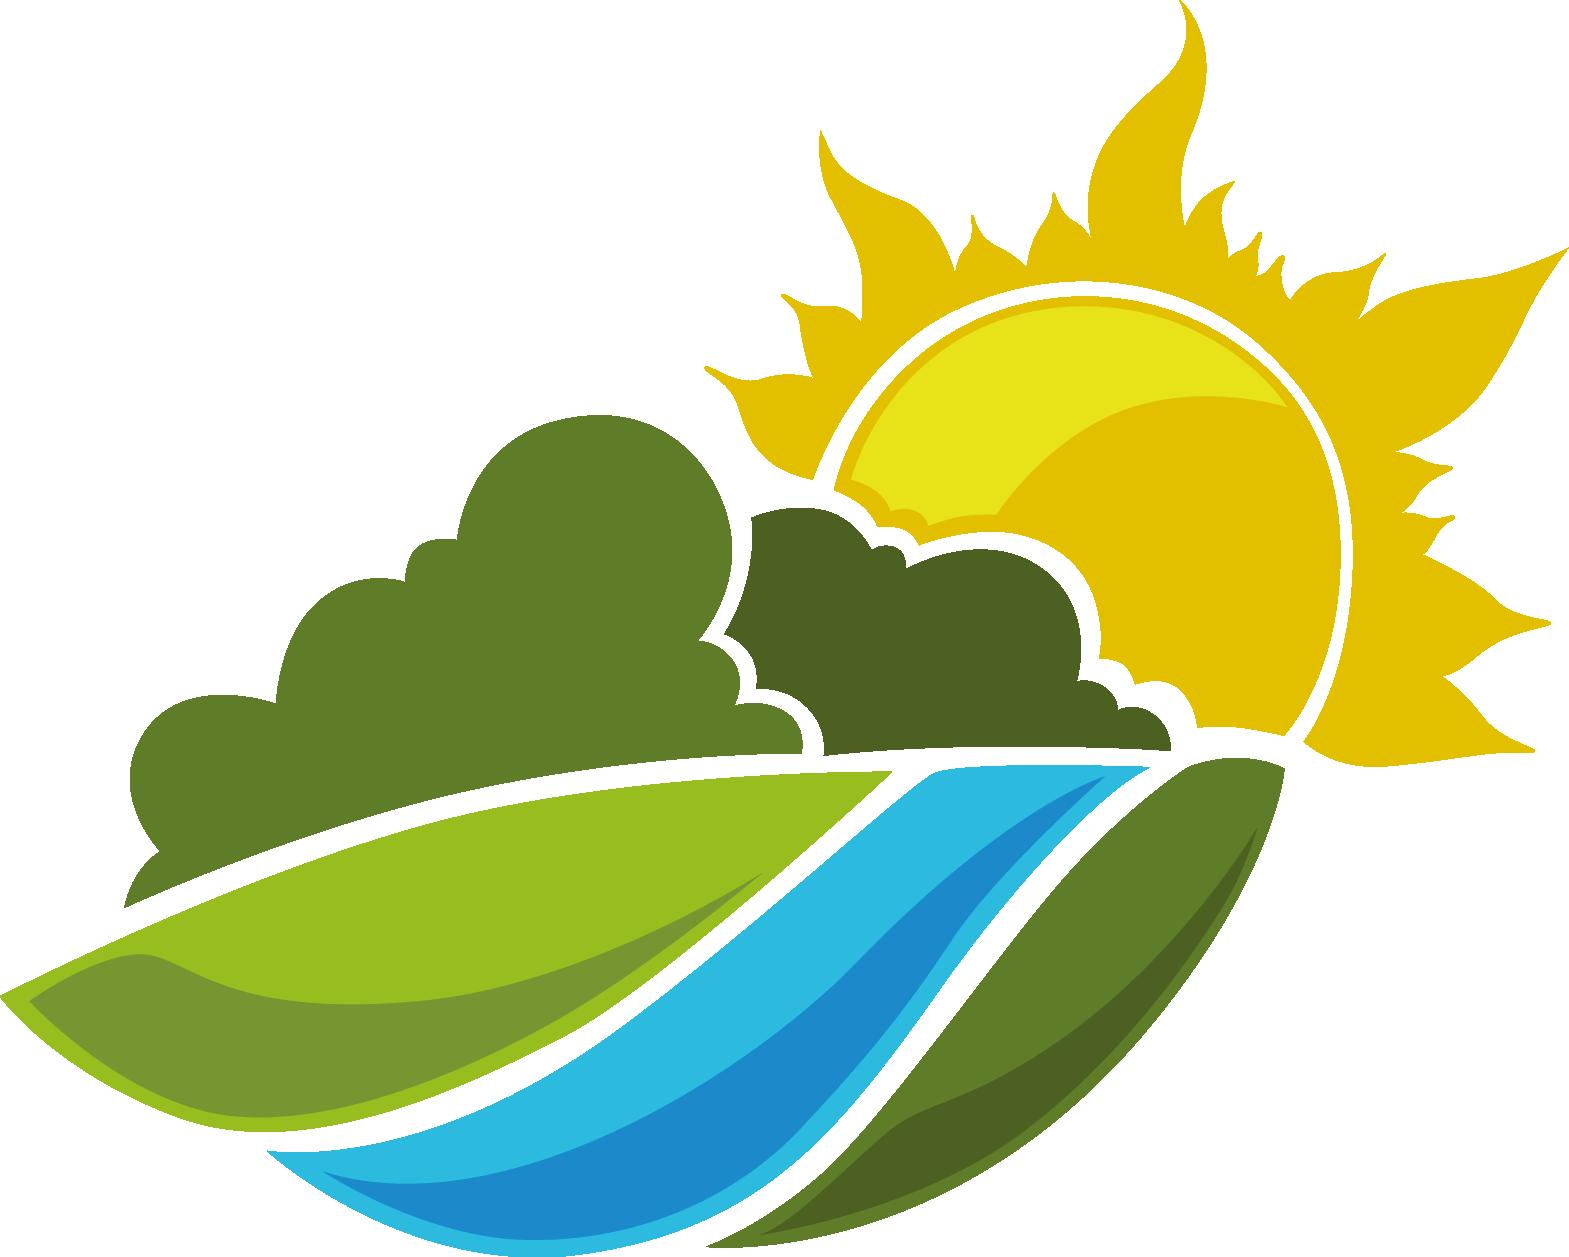 Logo landscaping clip art. Landscape clipart sun mountain